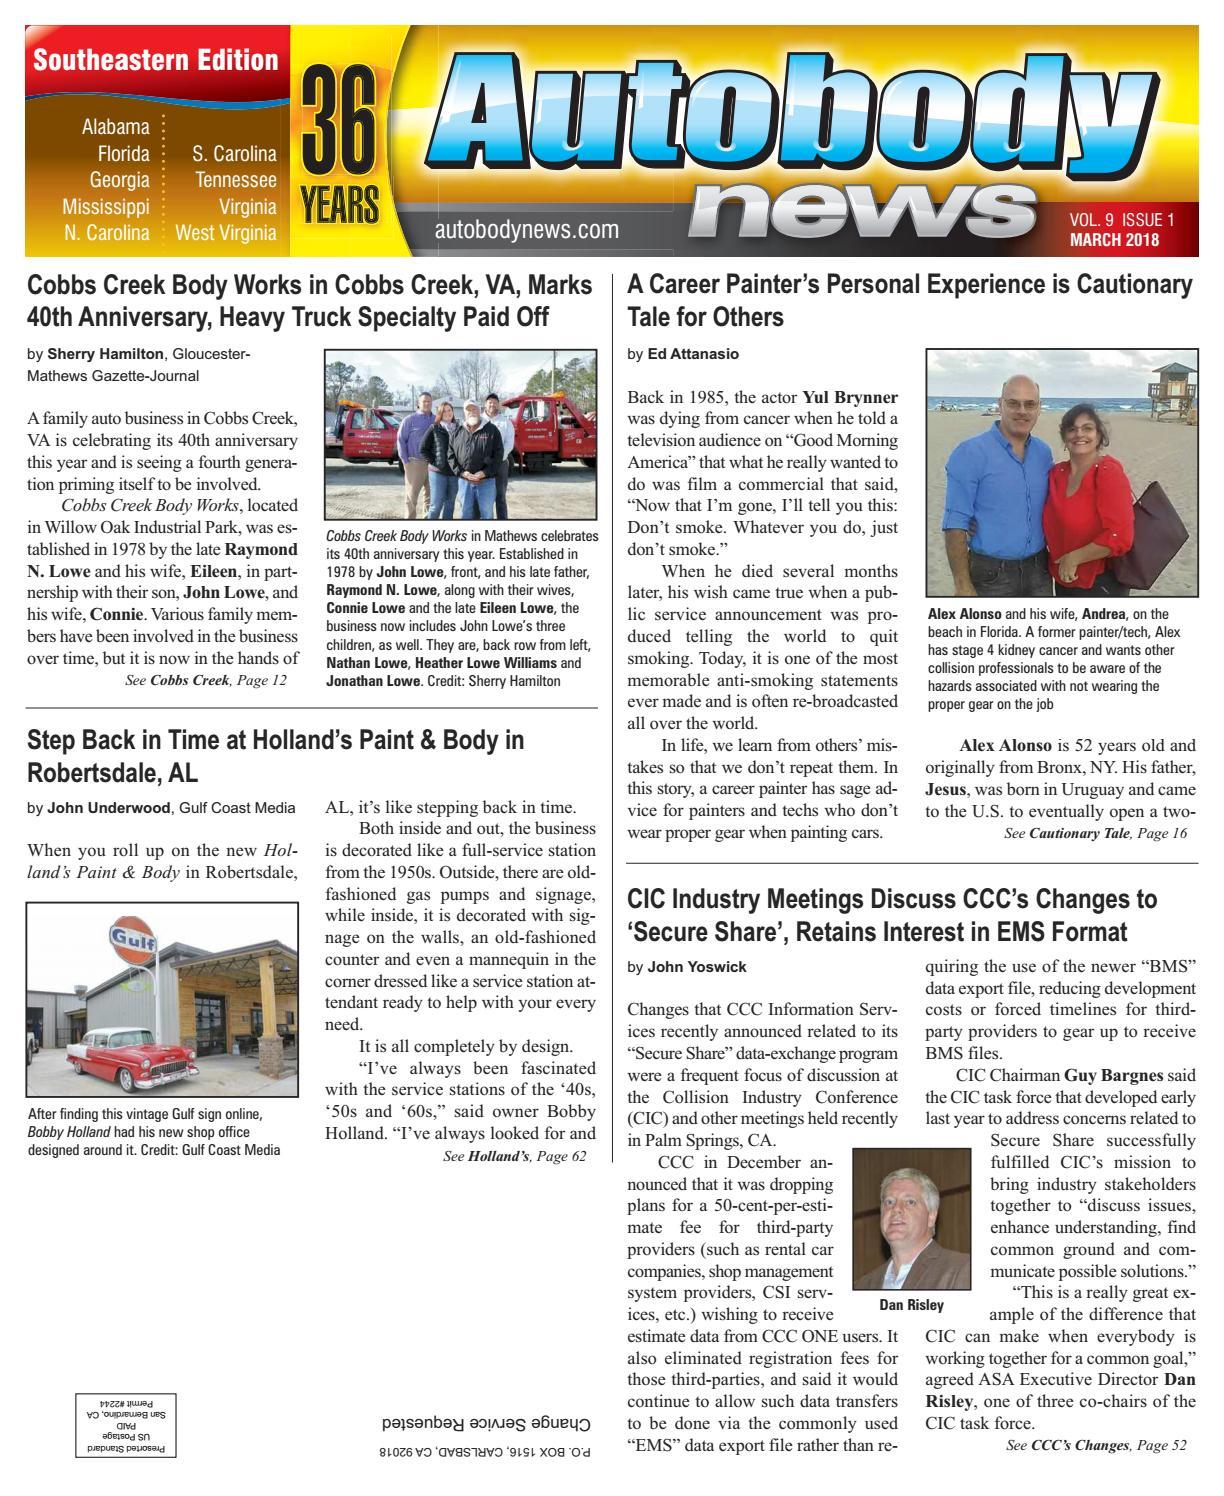 March 2018 Southeastern Edition by Autobody News - issuu